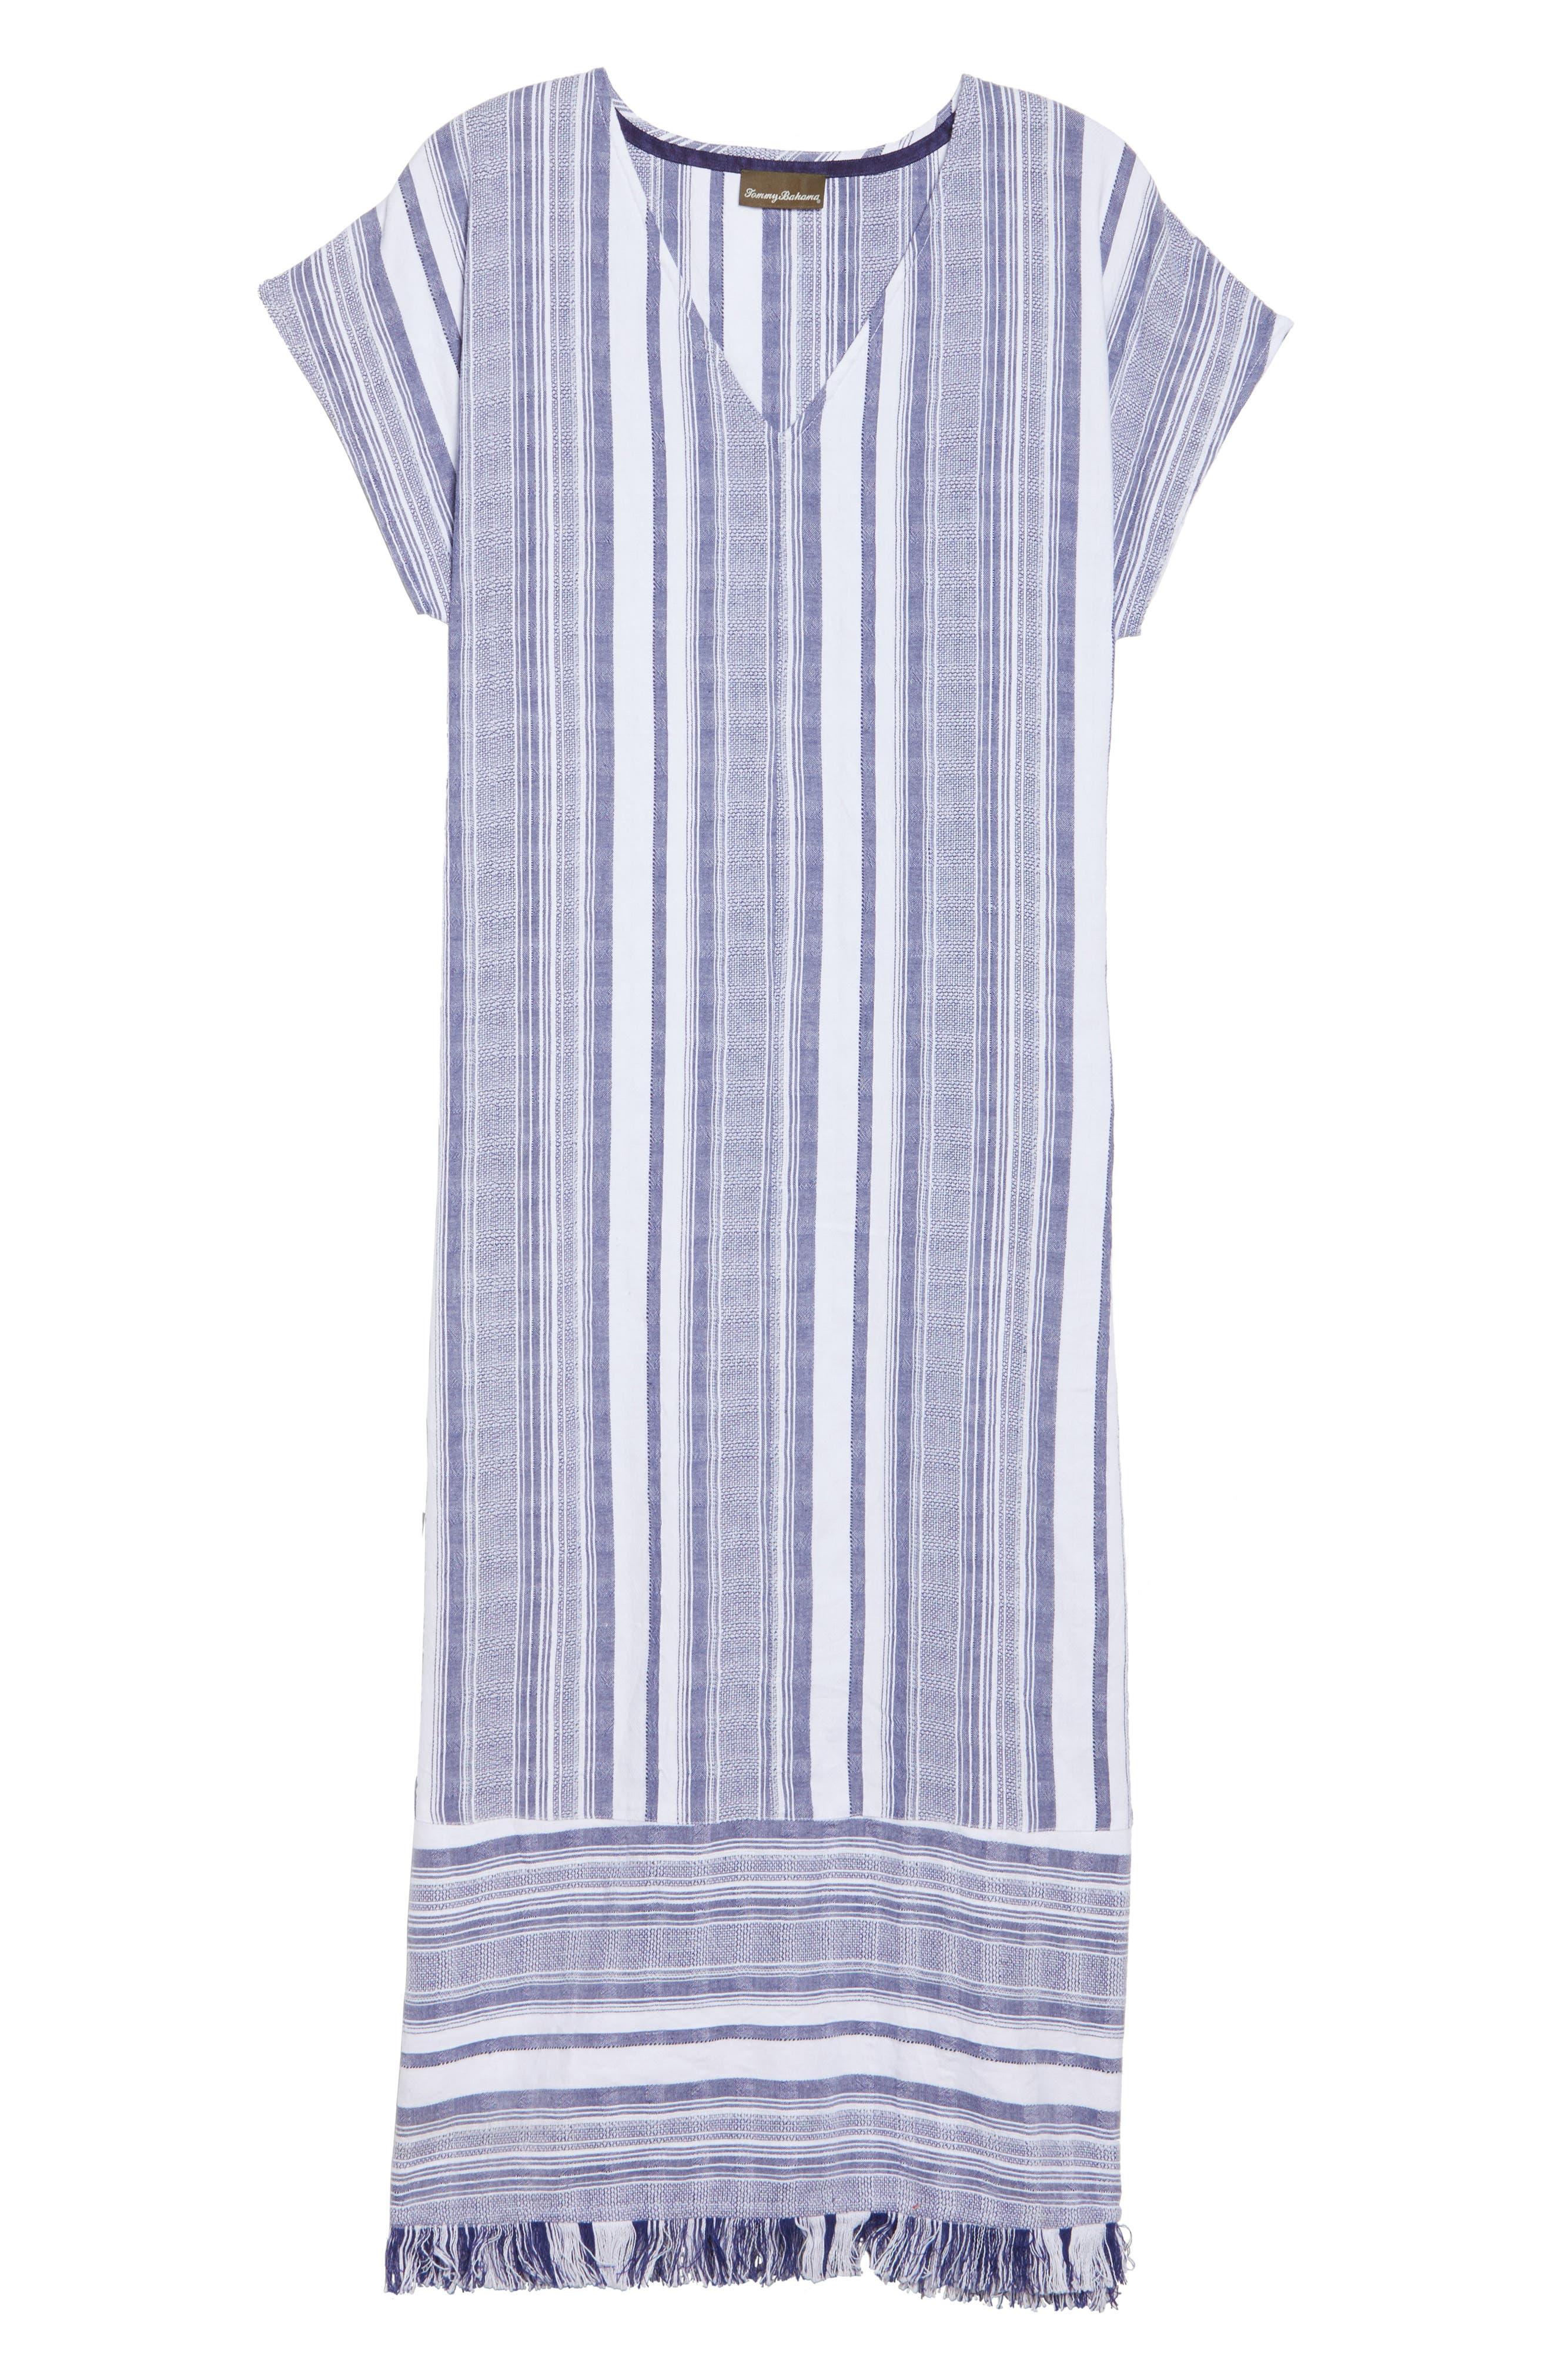 Yarn Dye Stripe Cover-Up Dress,                             Alternate thumbnail 6, color,                             100